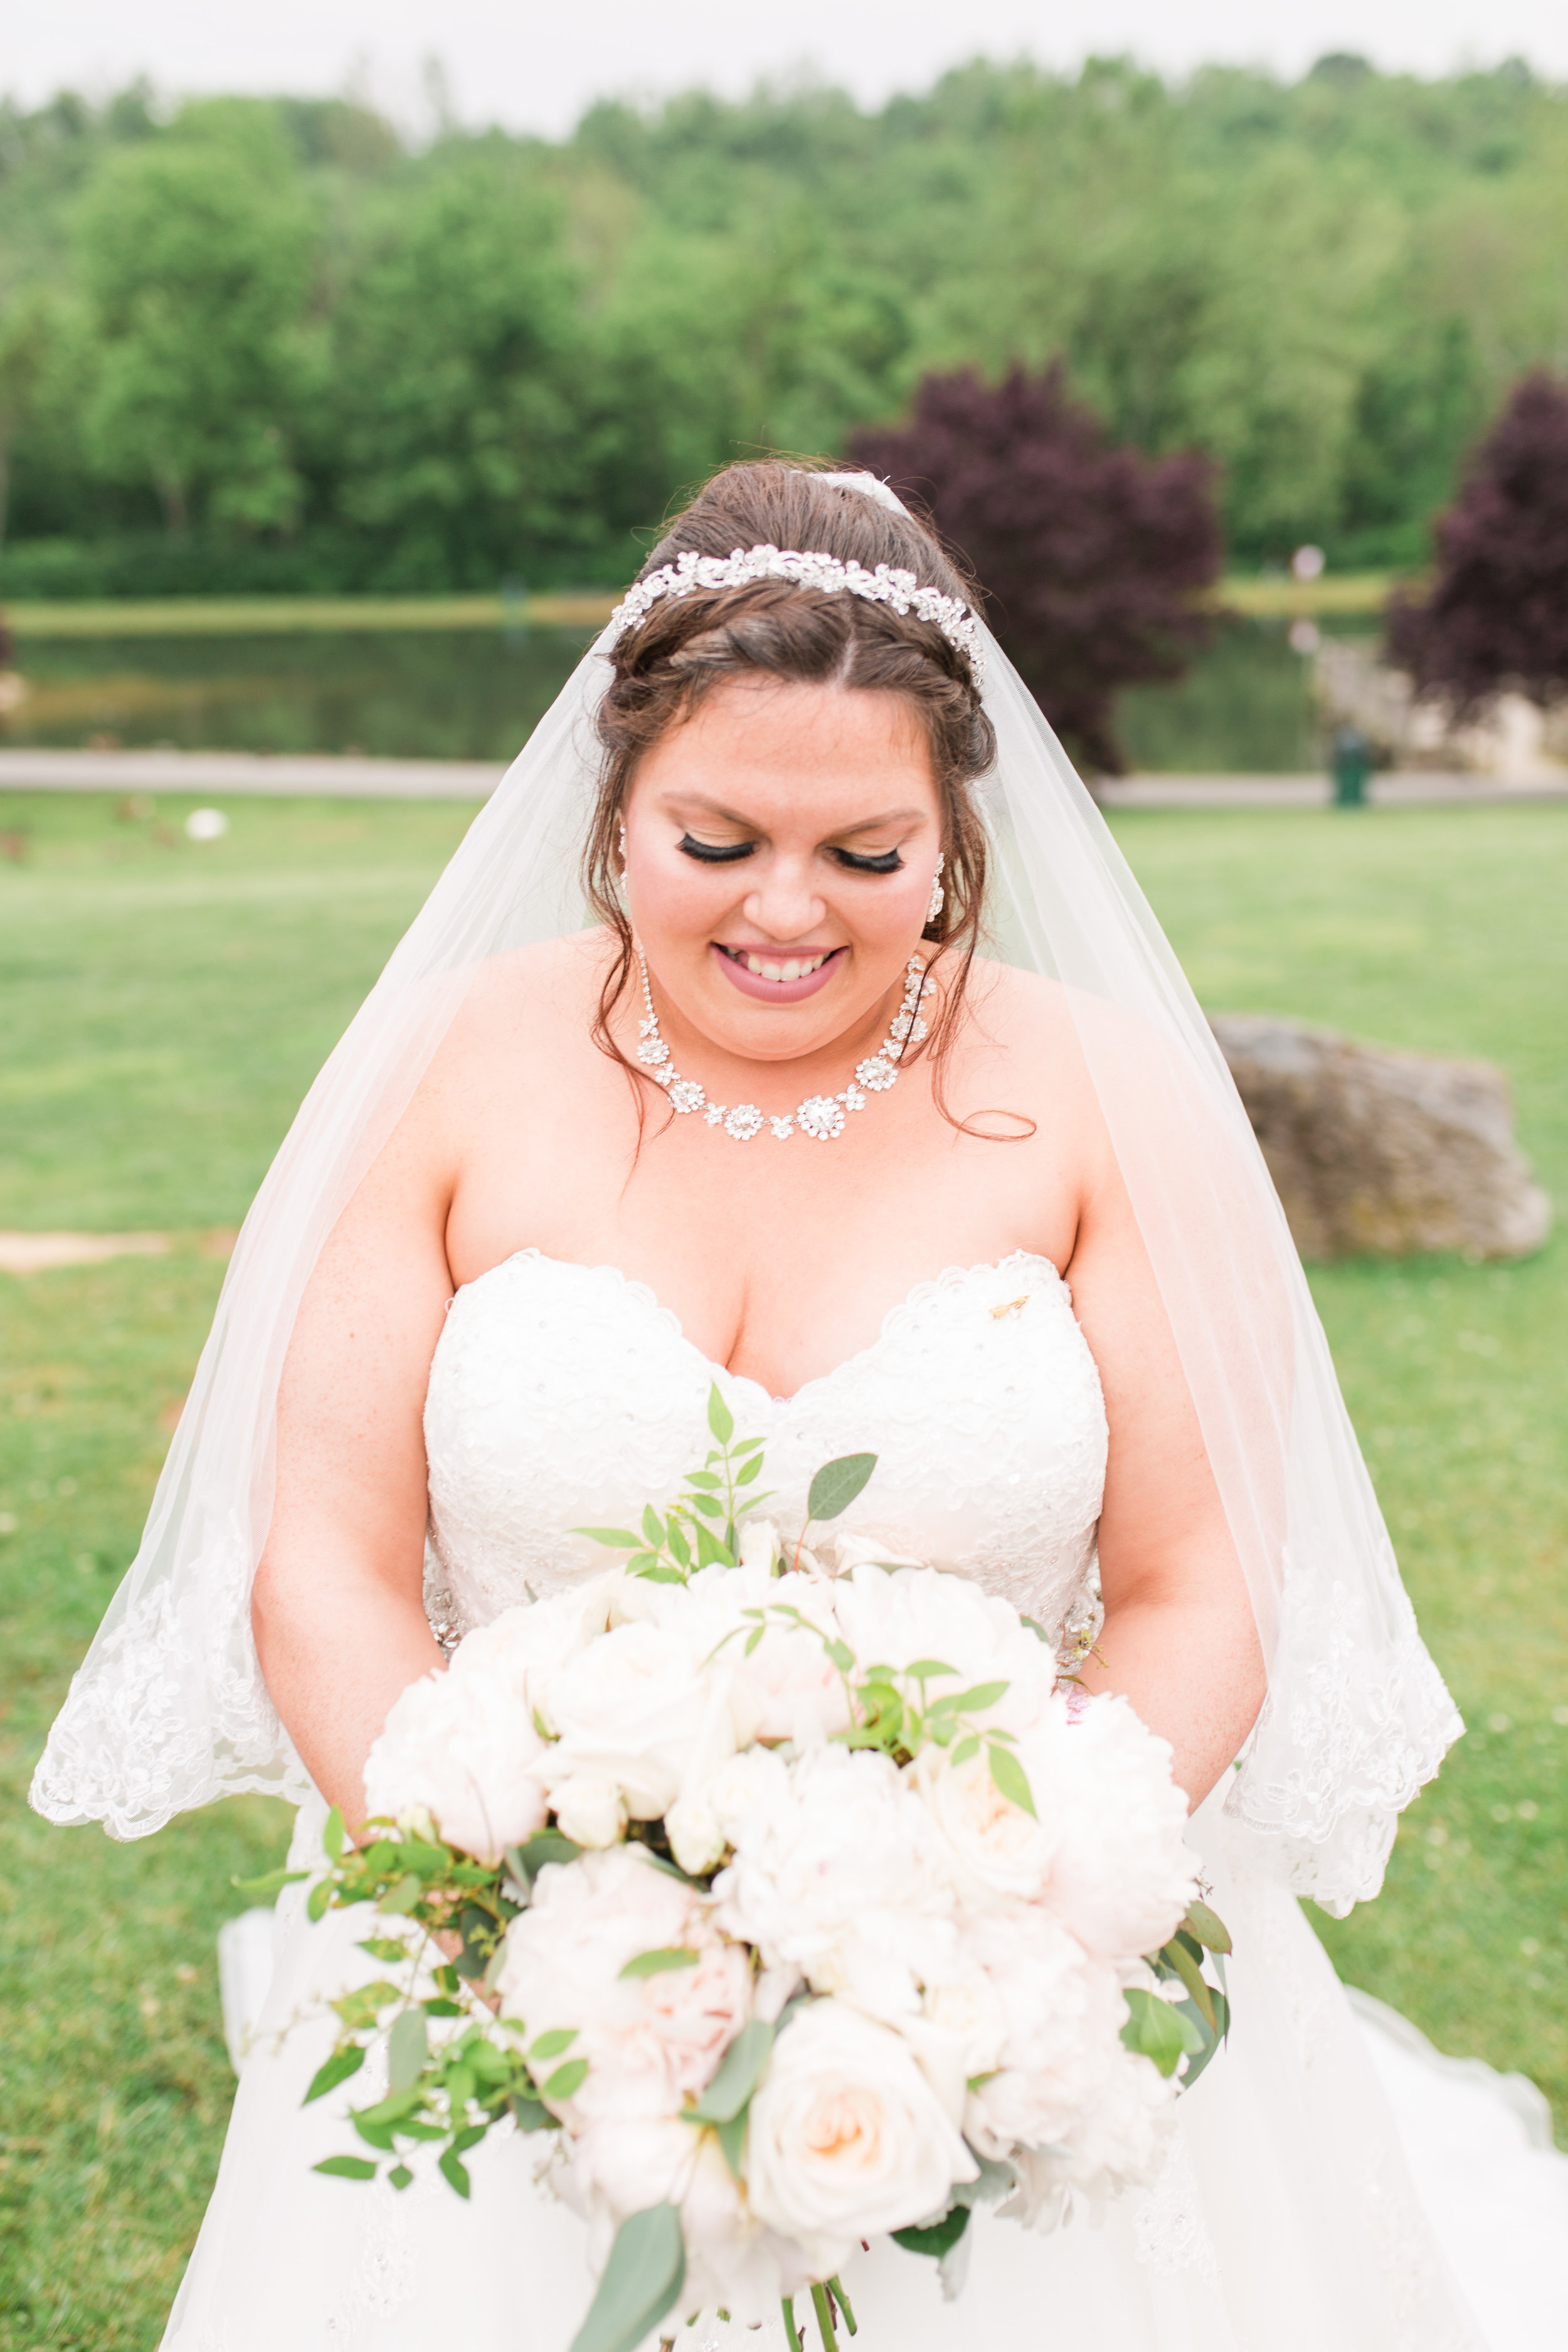 rachel+david bridal formals-2nd edit-6